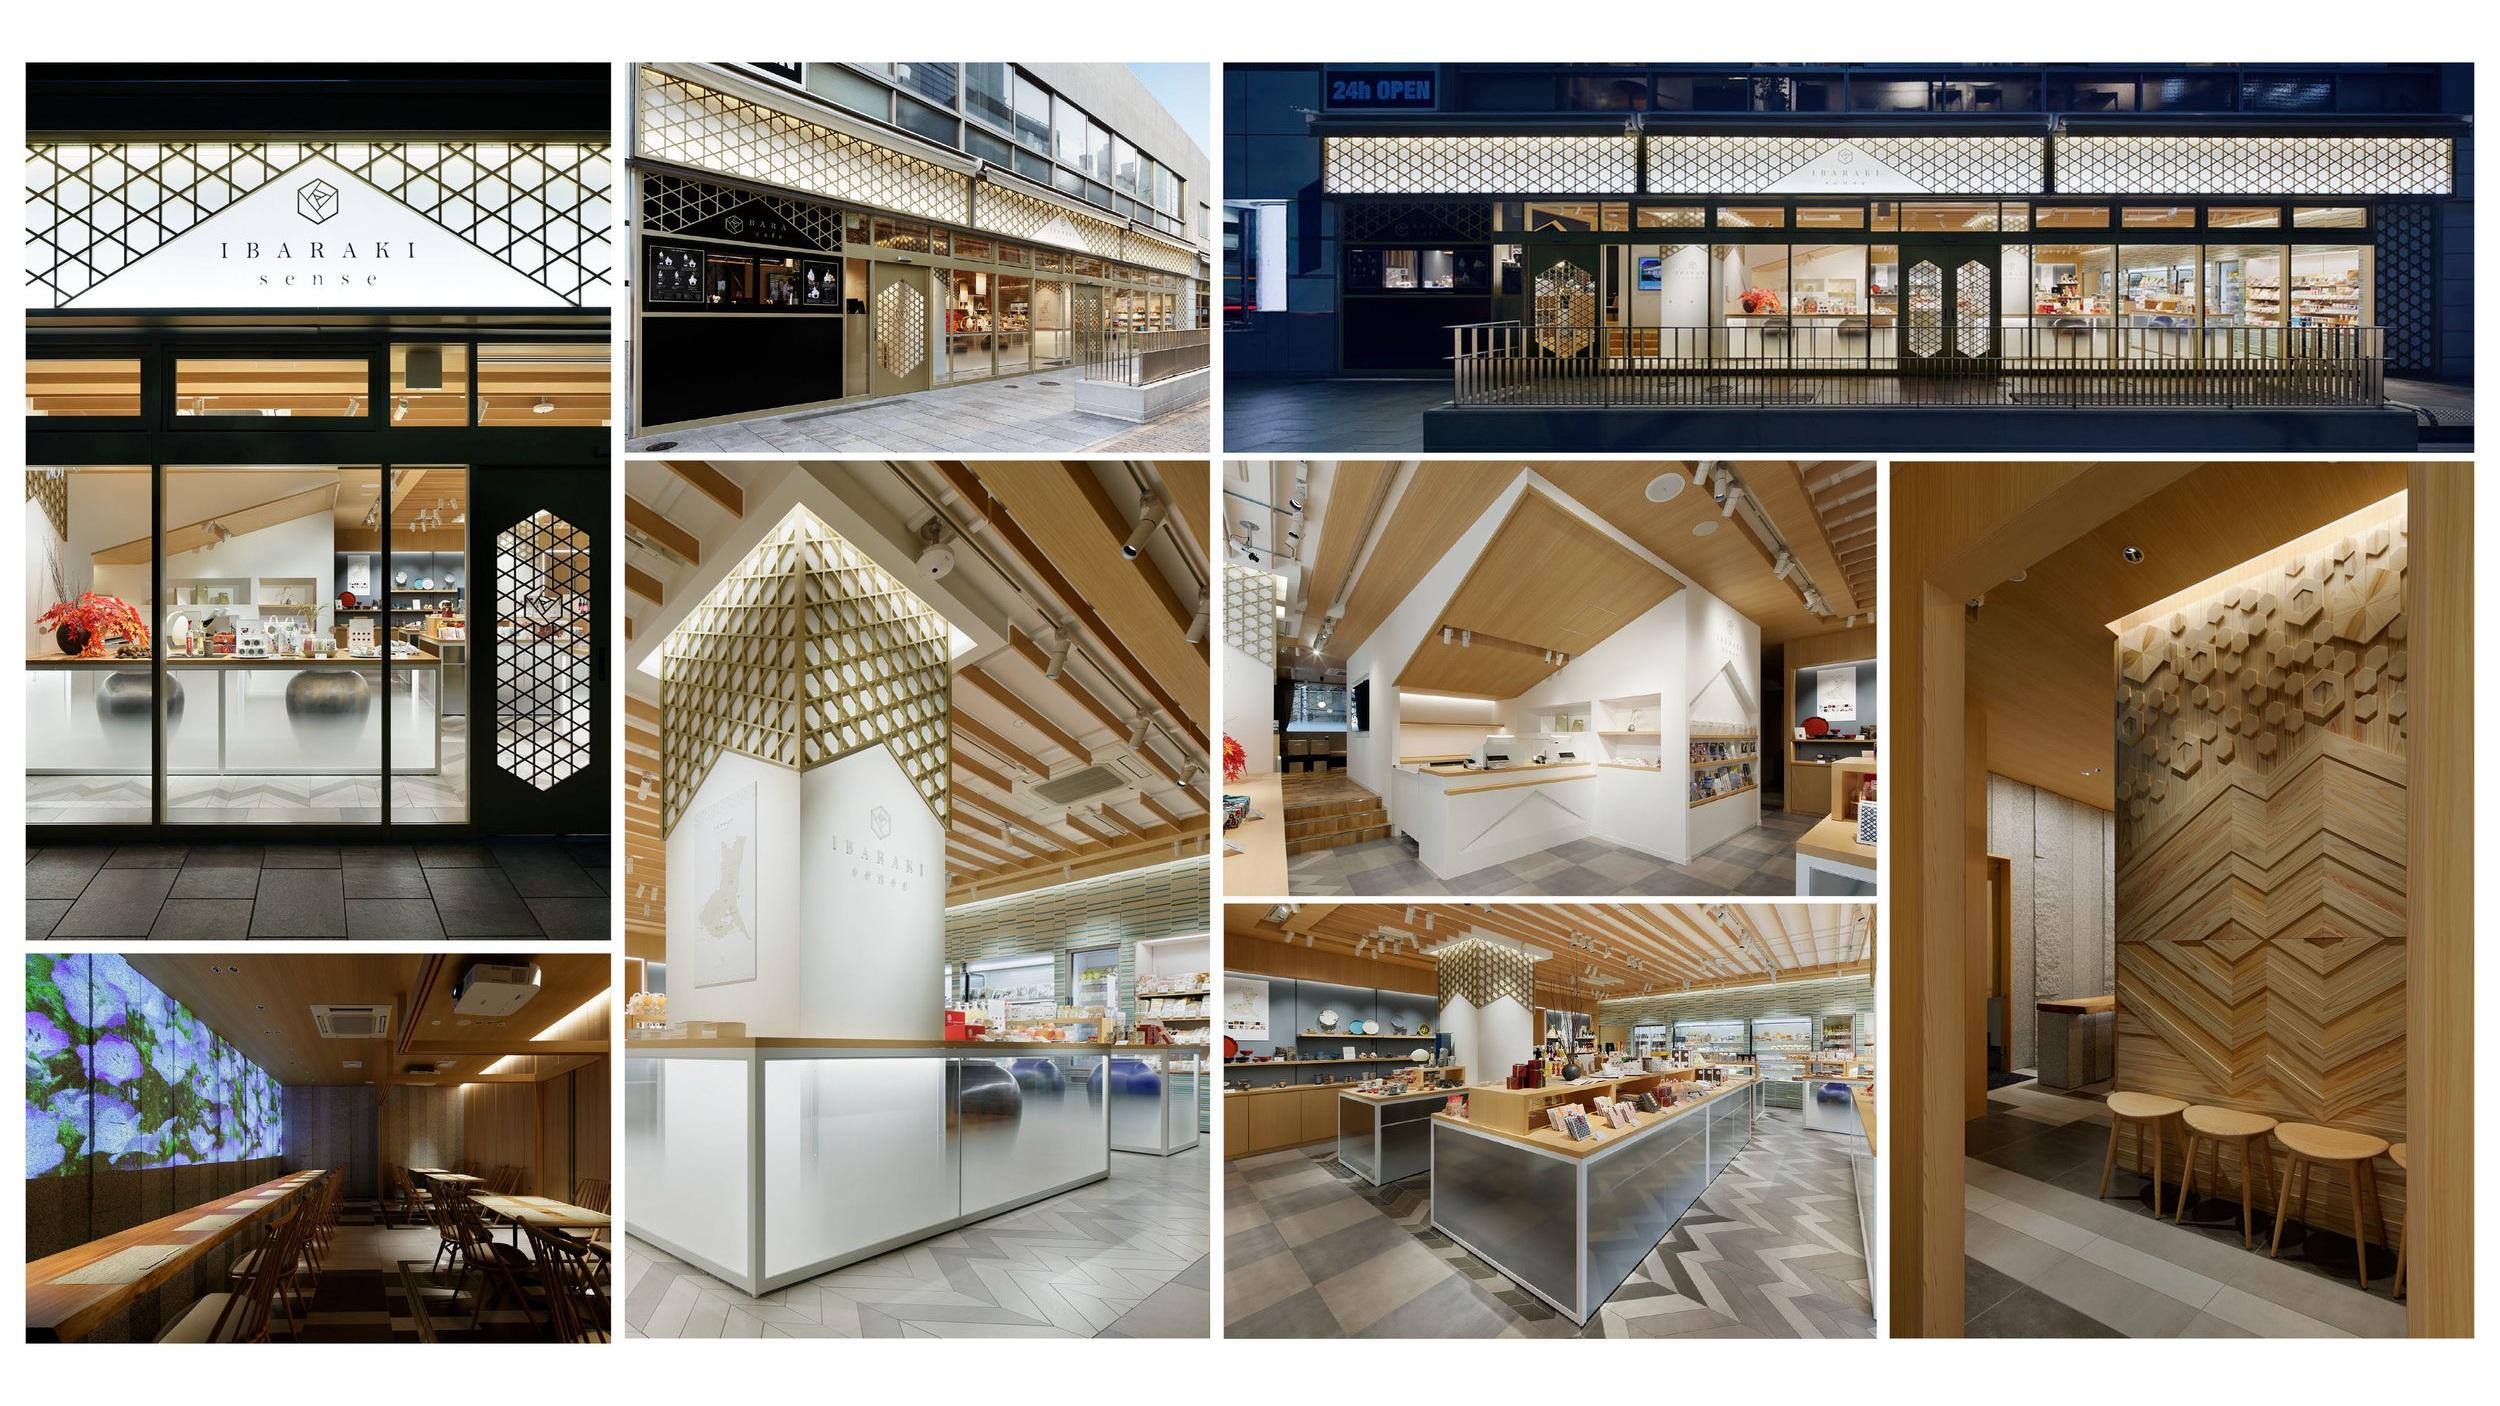 IBARAKIsense - Design by: J.FRONT DESIGN & CONSTRUCTION Co.,Ltd.Interior Division: Retail DesignWebsite: https://www.jfdc.co.jp/english